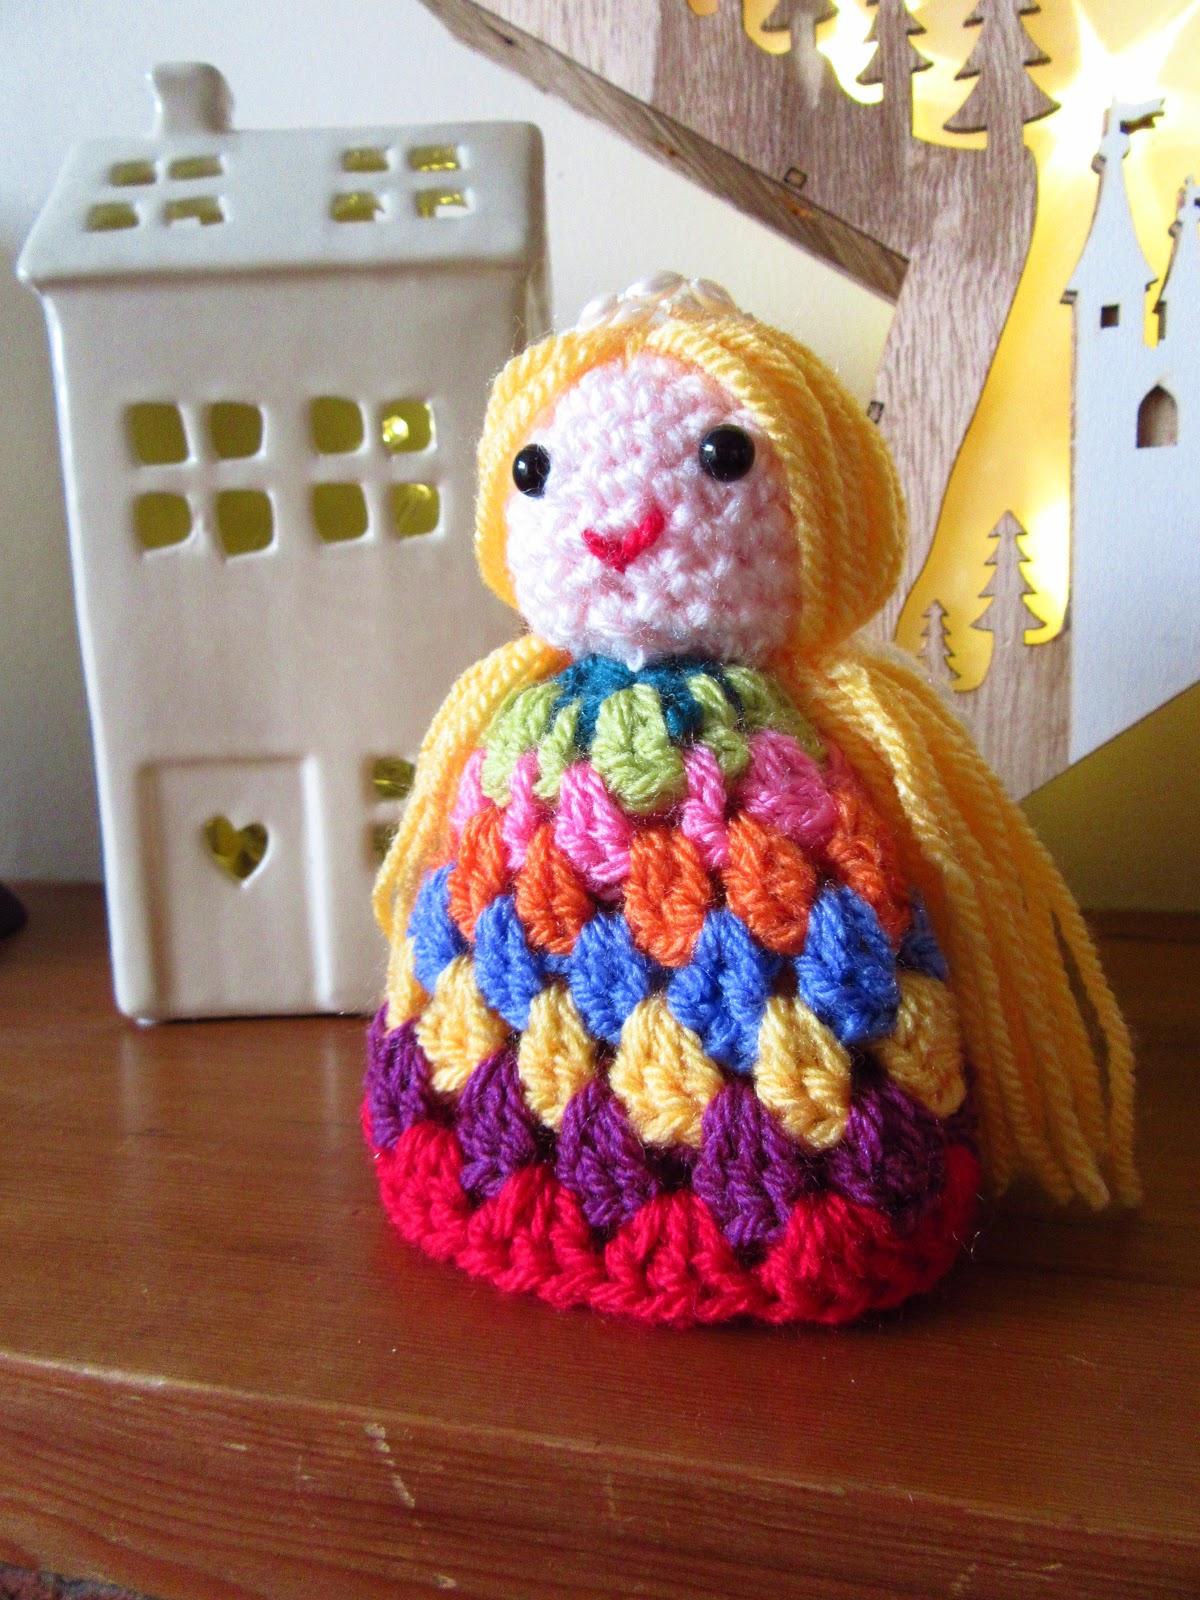 Bunny Mummy Easy Crochet Angel Tutorial Amigurumi refers to the crocheting of stuffed animals, toys, dolls, objects. bunny mummy easy crochet angel tutorial